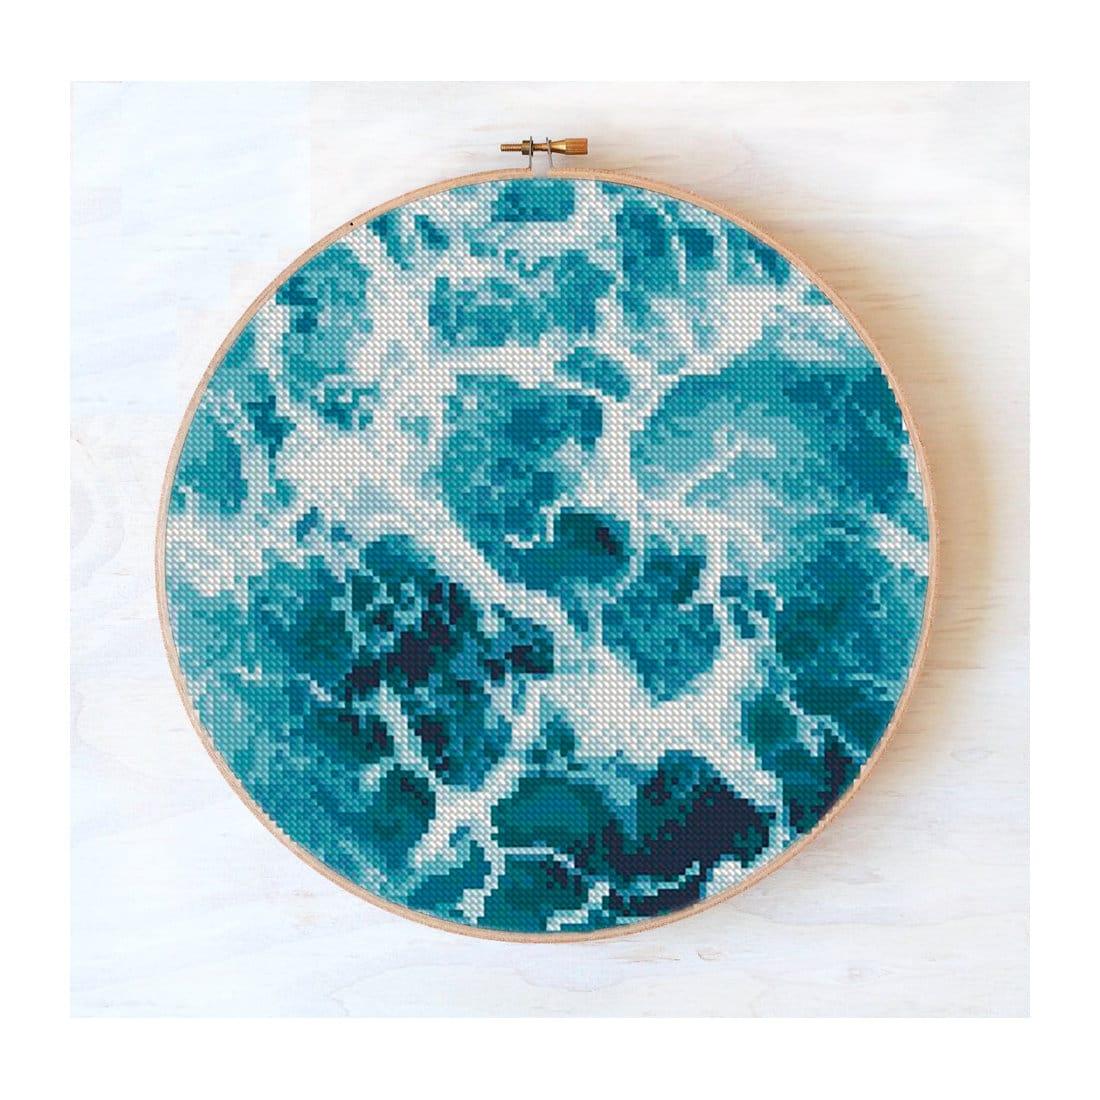 Modern cross stitch pattern ocean wave, nature cross stitch landscape, sea wave, summer cross stitch #485